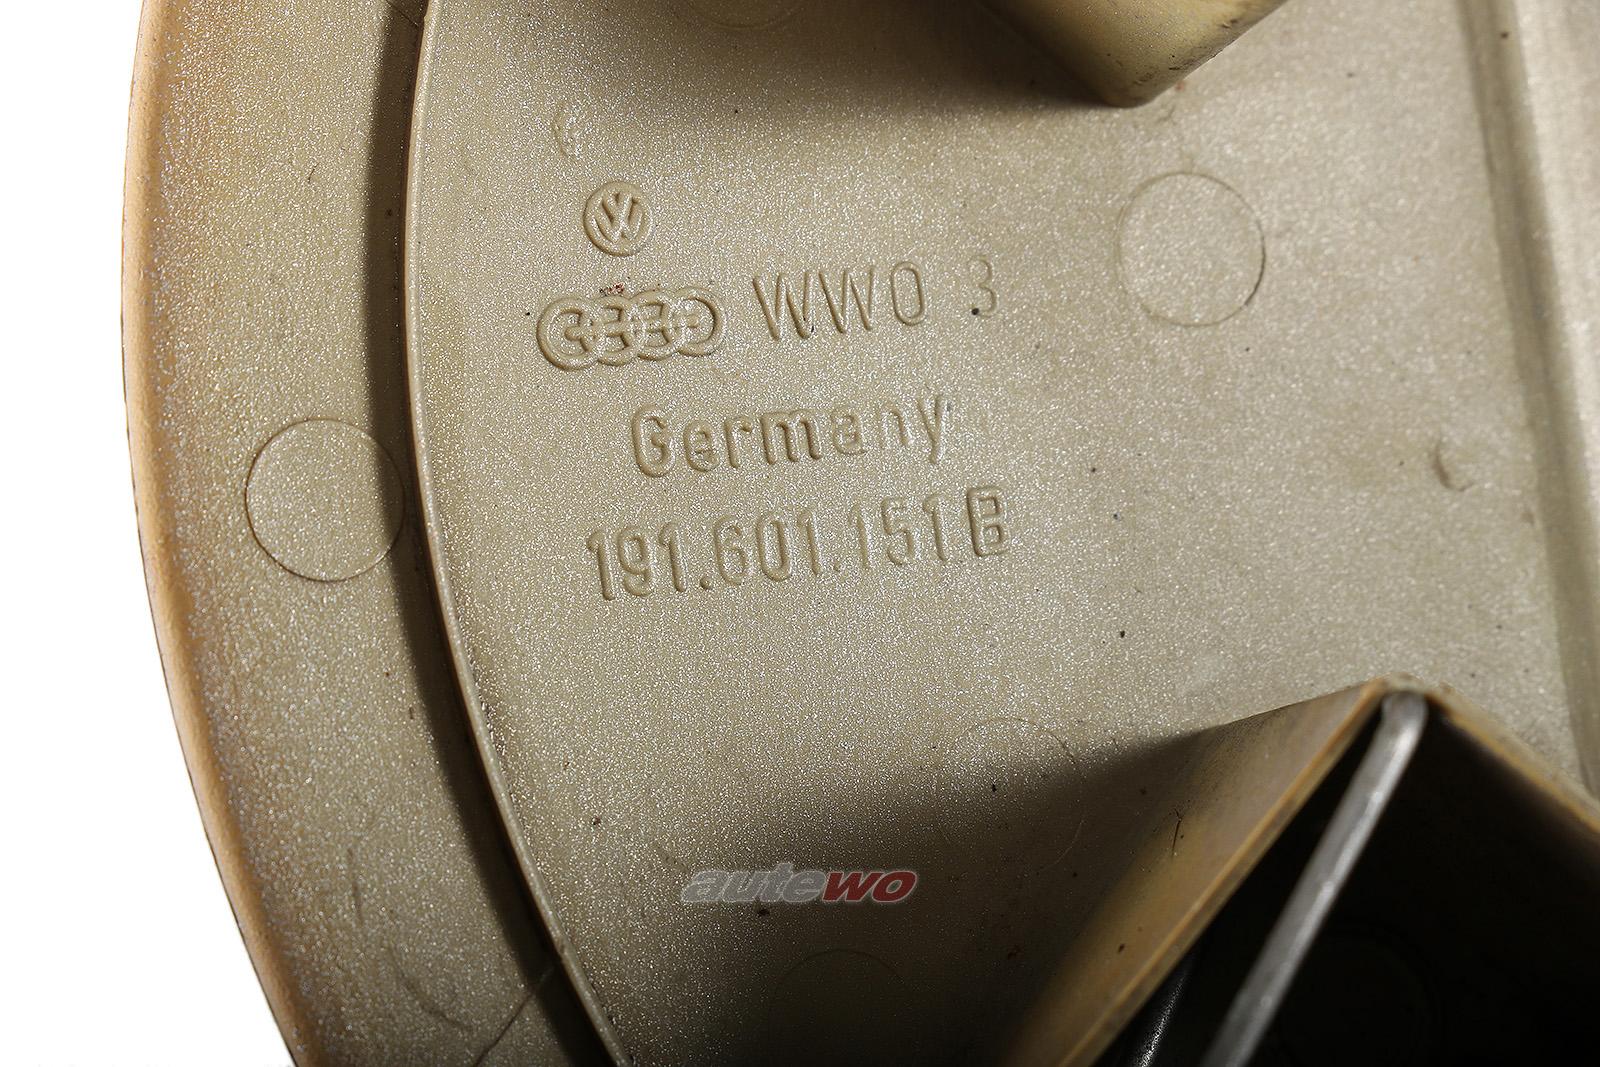 191601151B VW Golf 2/Jetta/Polo/Passat 32B/Scirocco Nabenabdeckung original